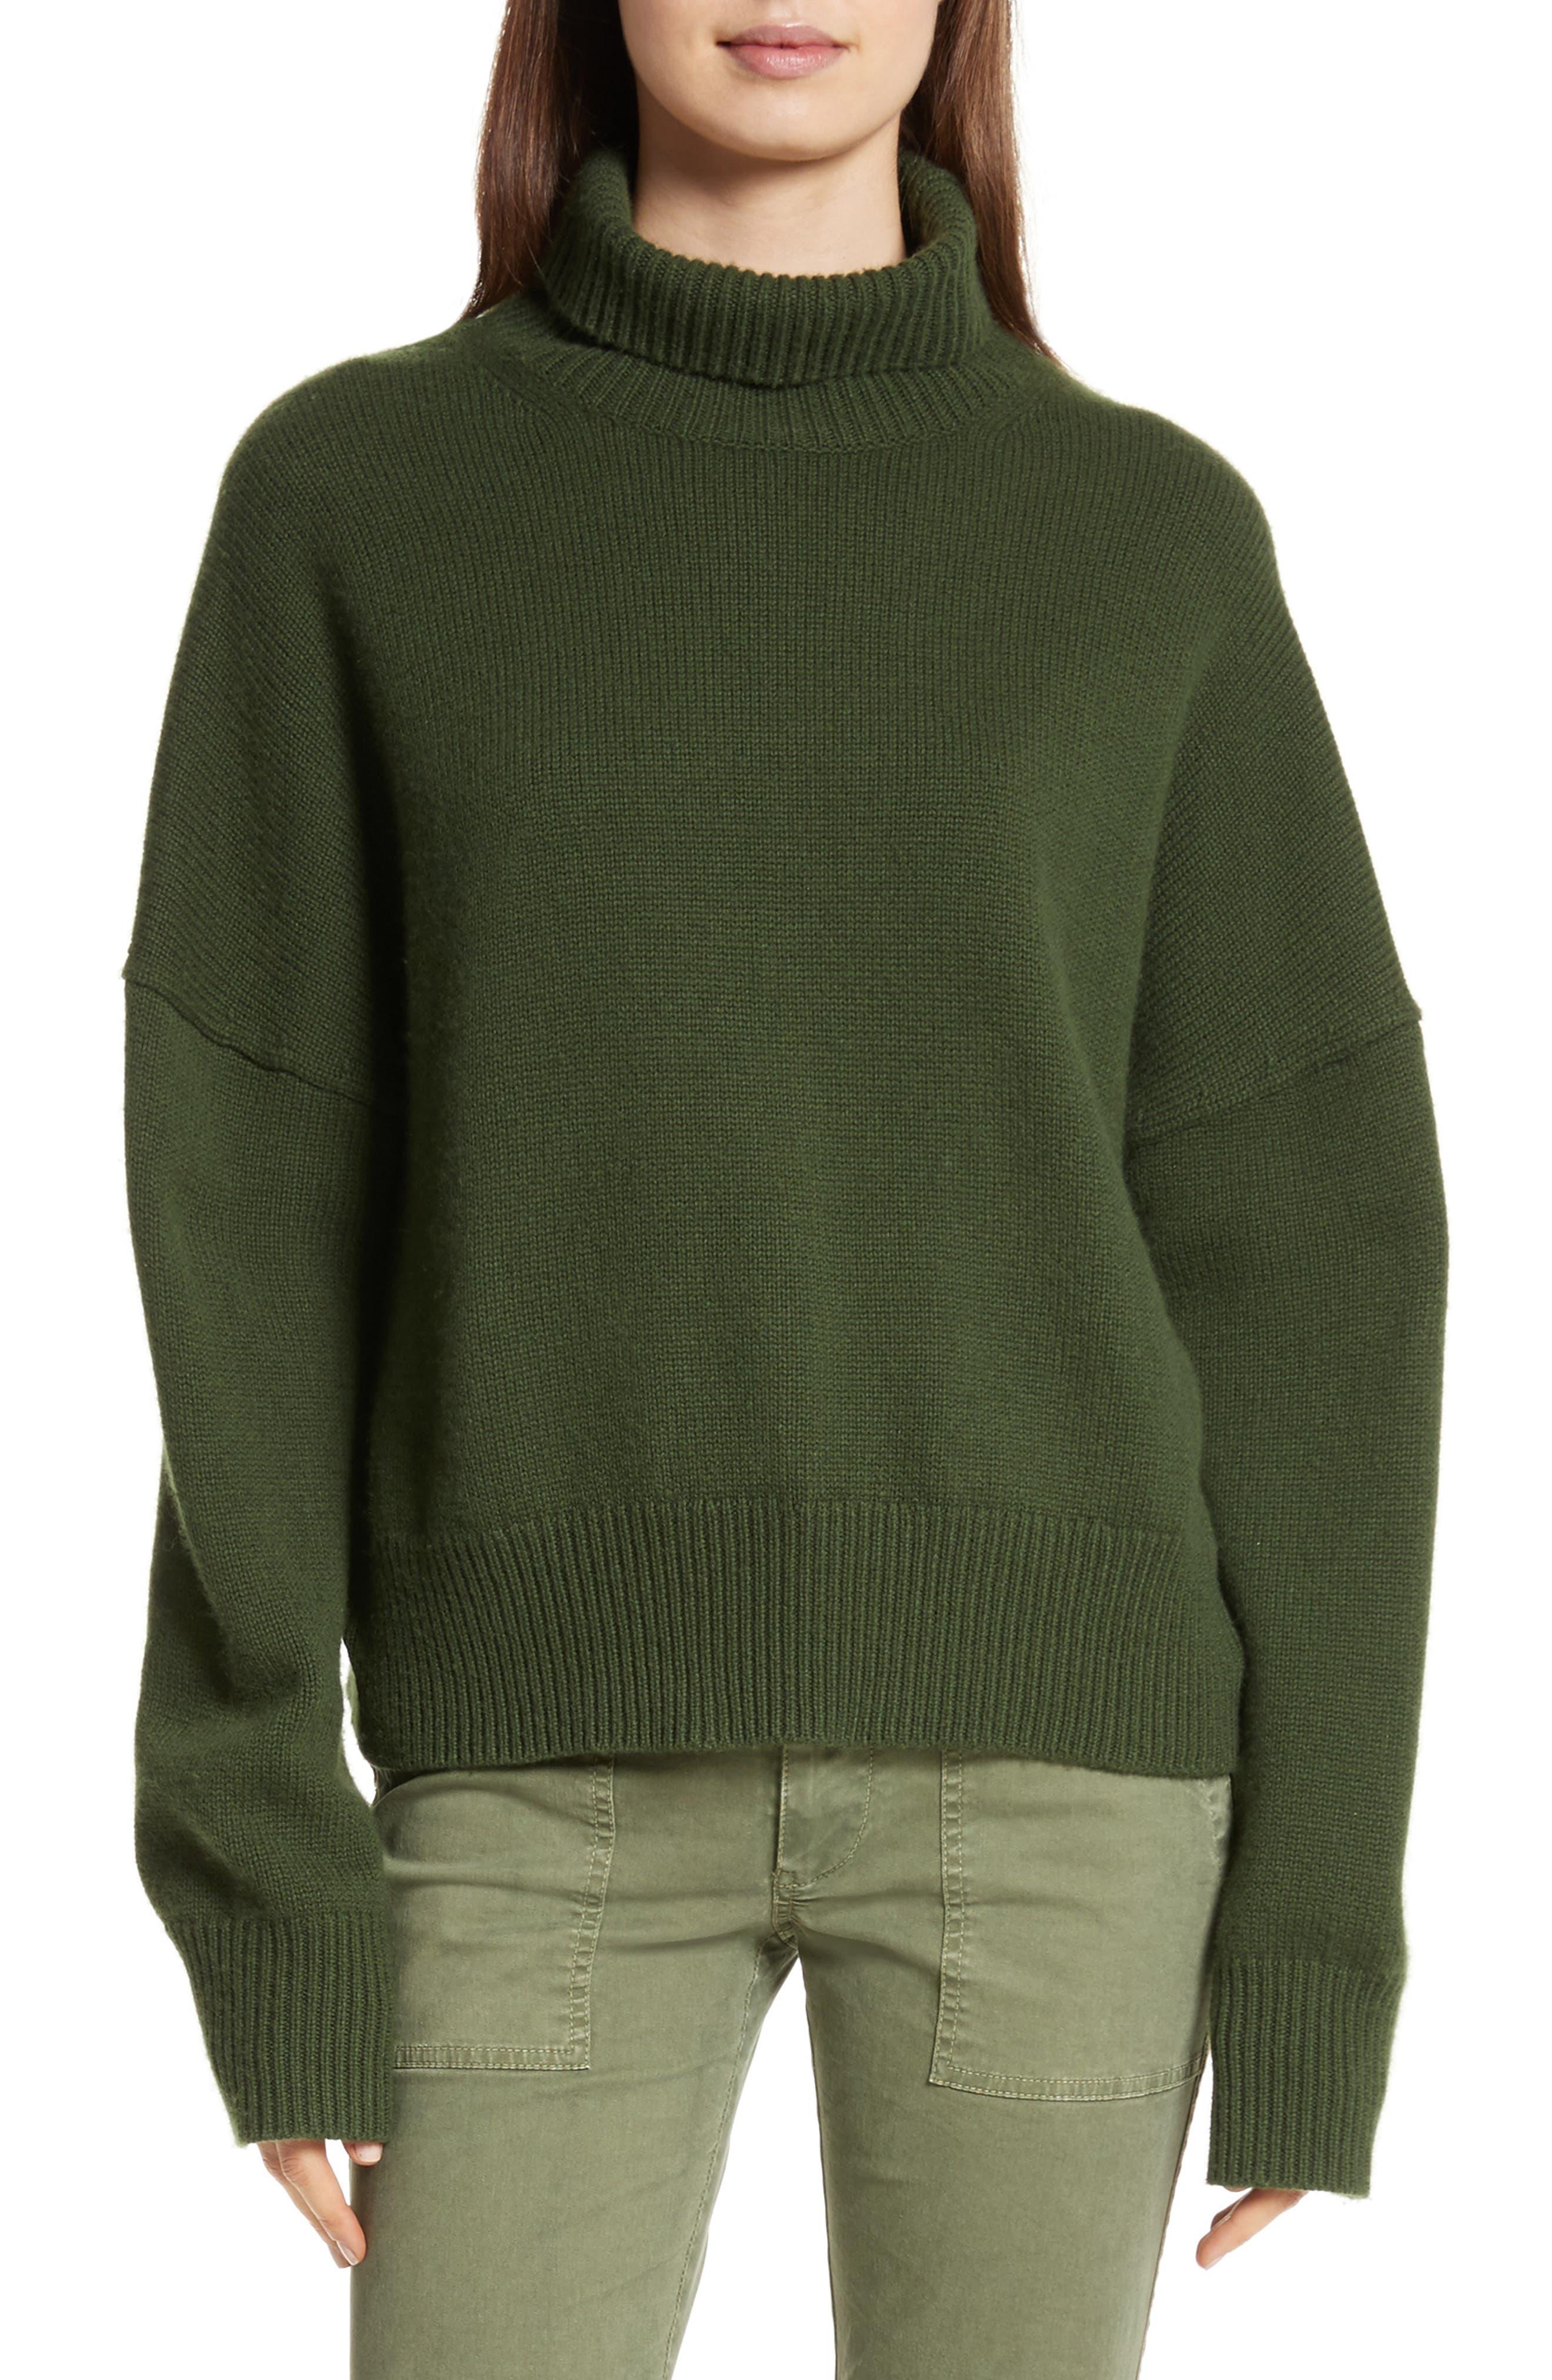 Serinda Wool & Cashmere Turtleneck Sweater,                         Main,                         color, 303